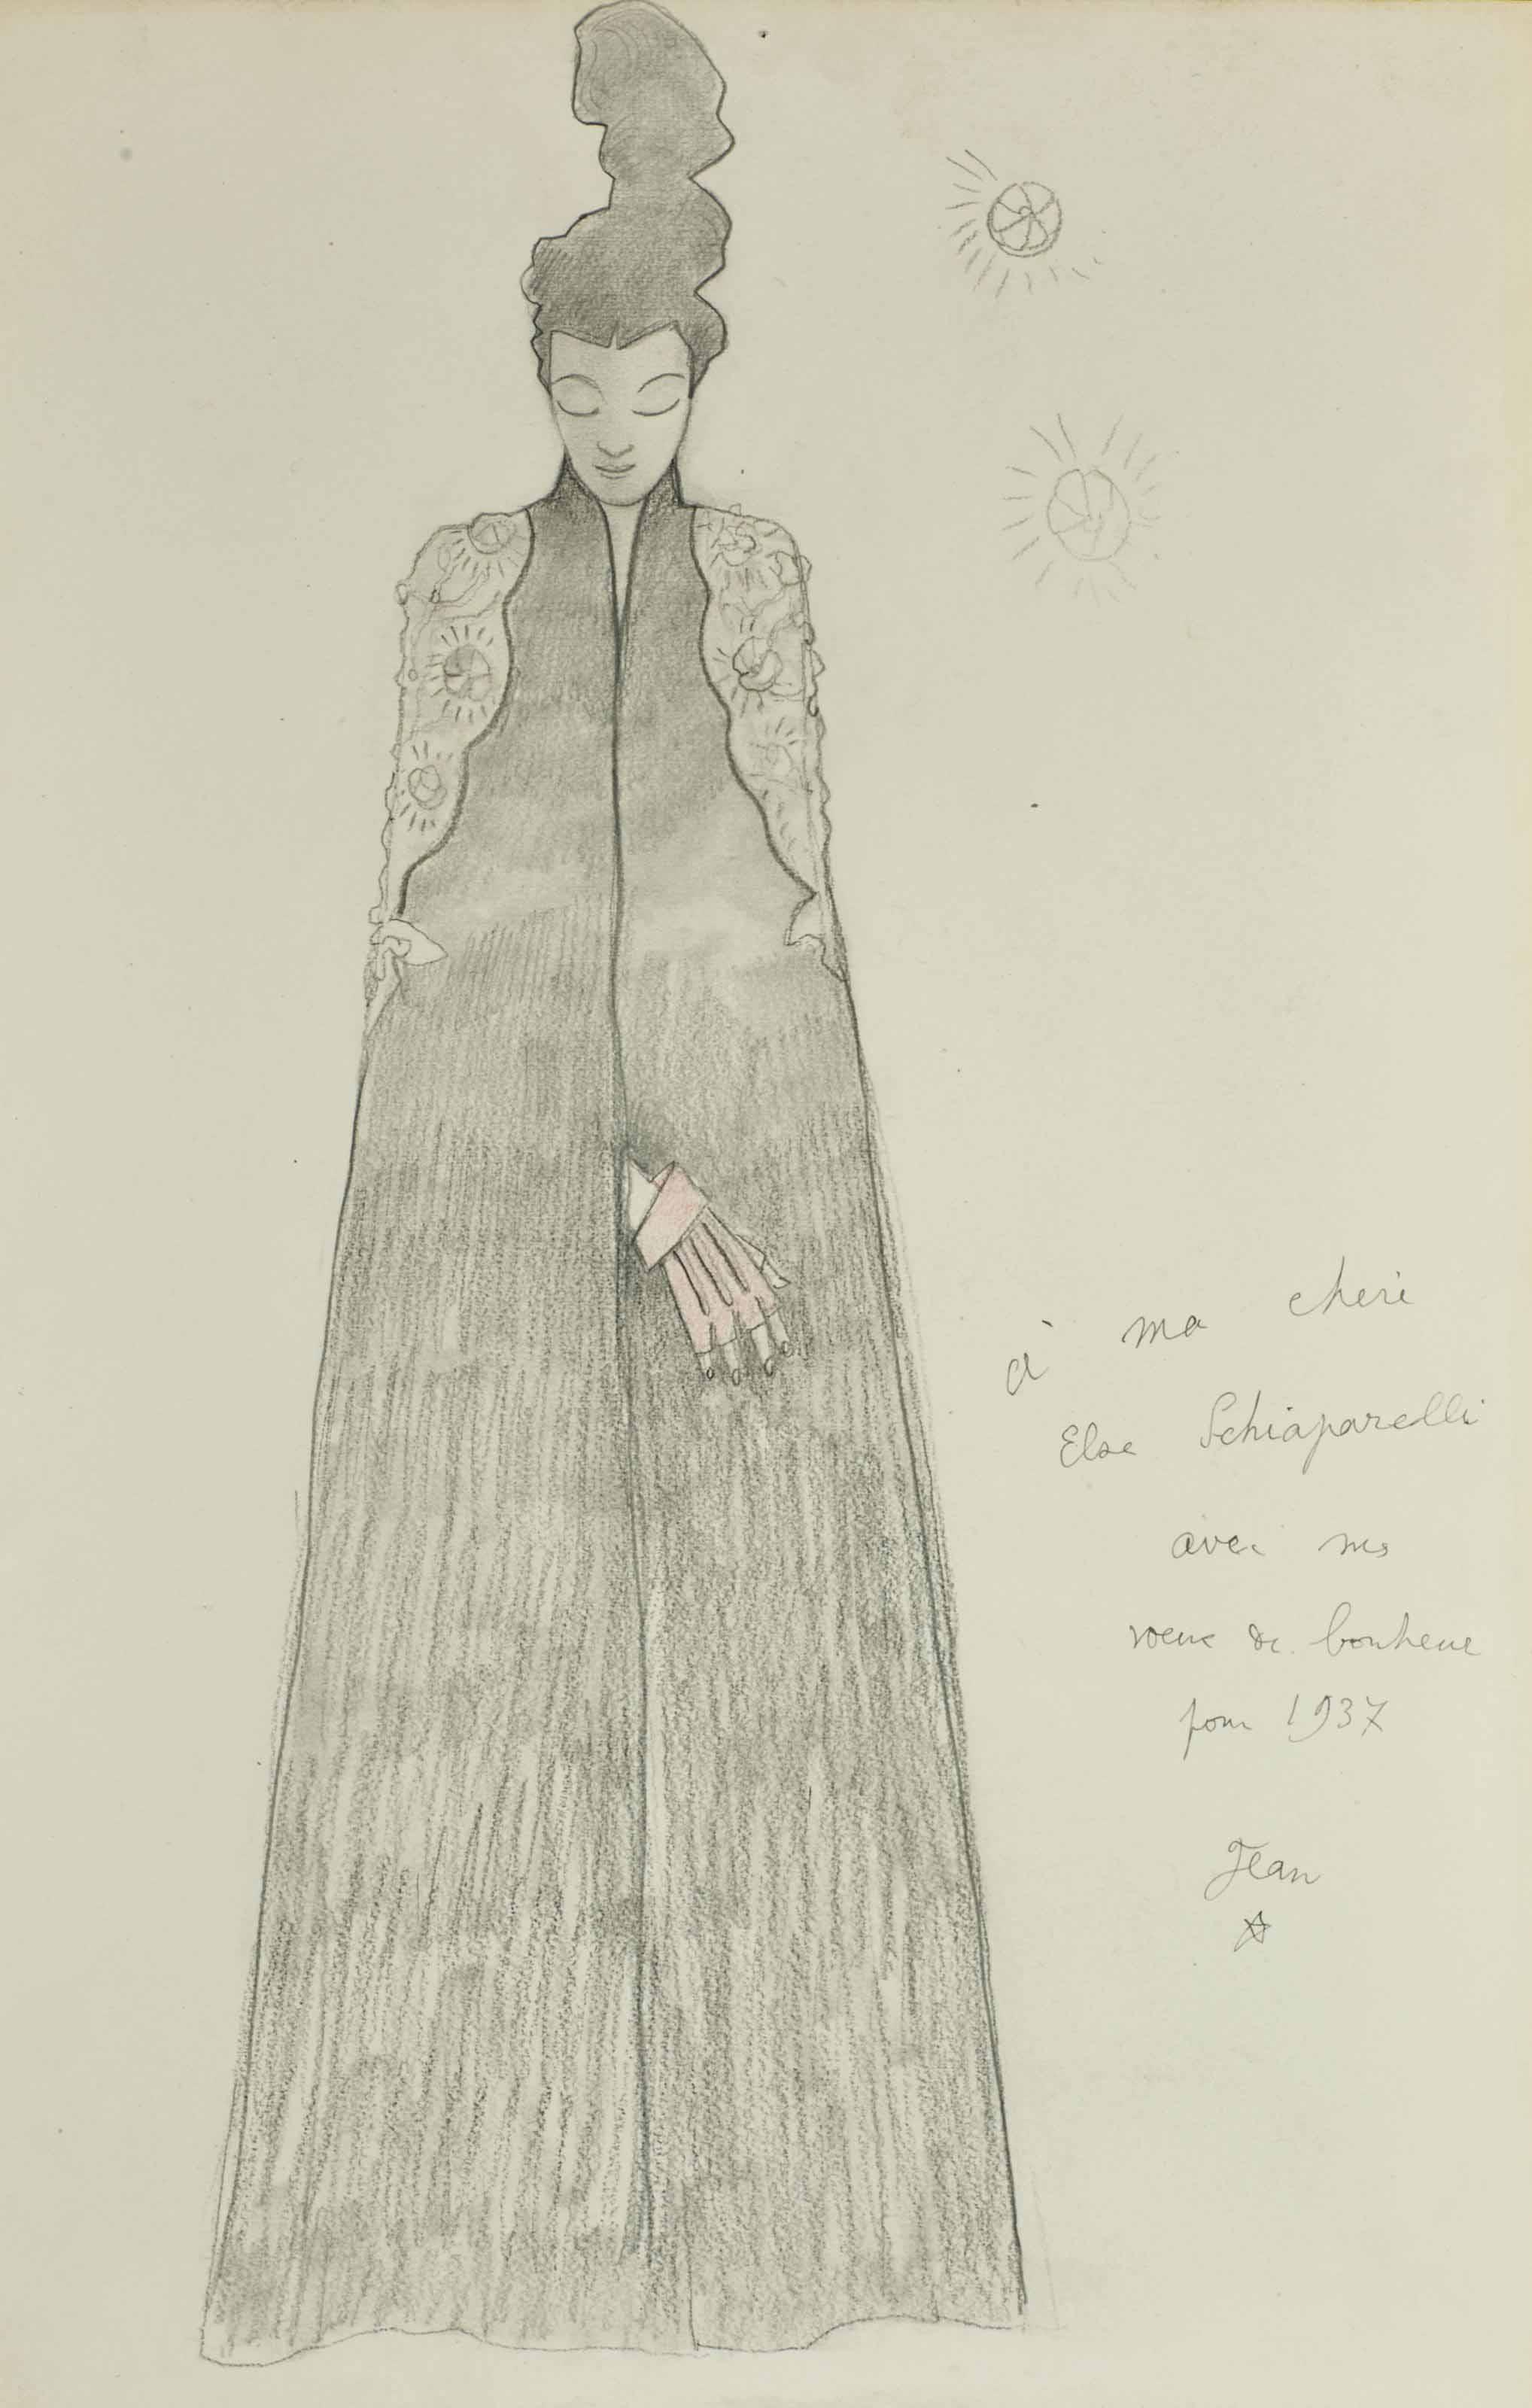 Portrait de Madame Schiaparelli